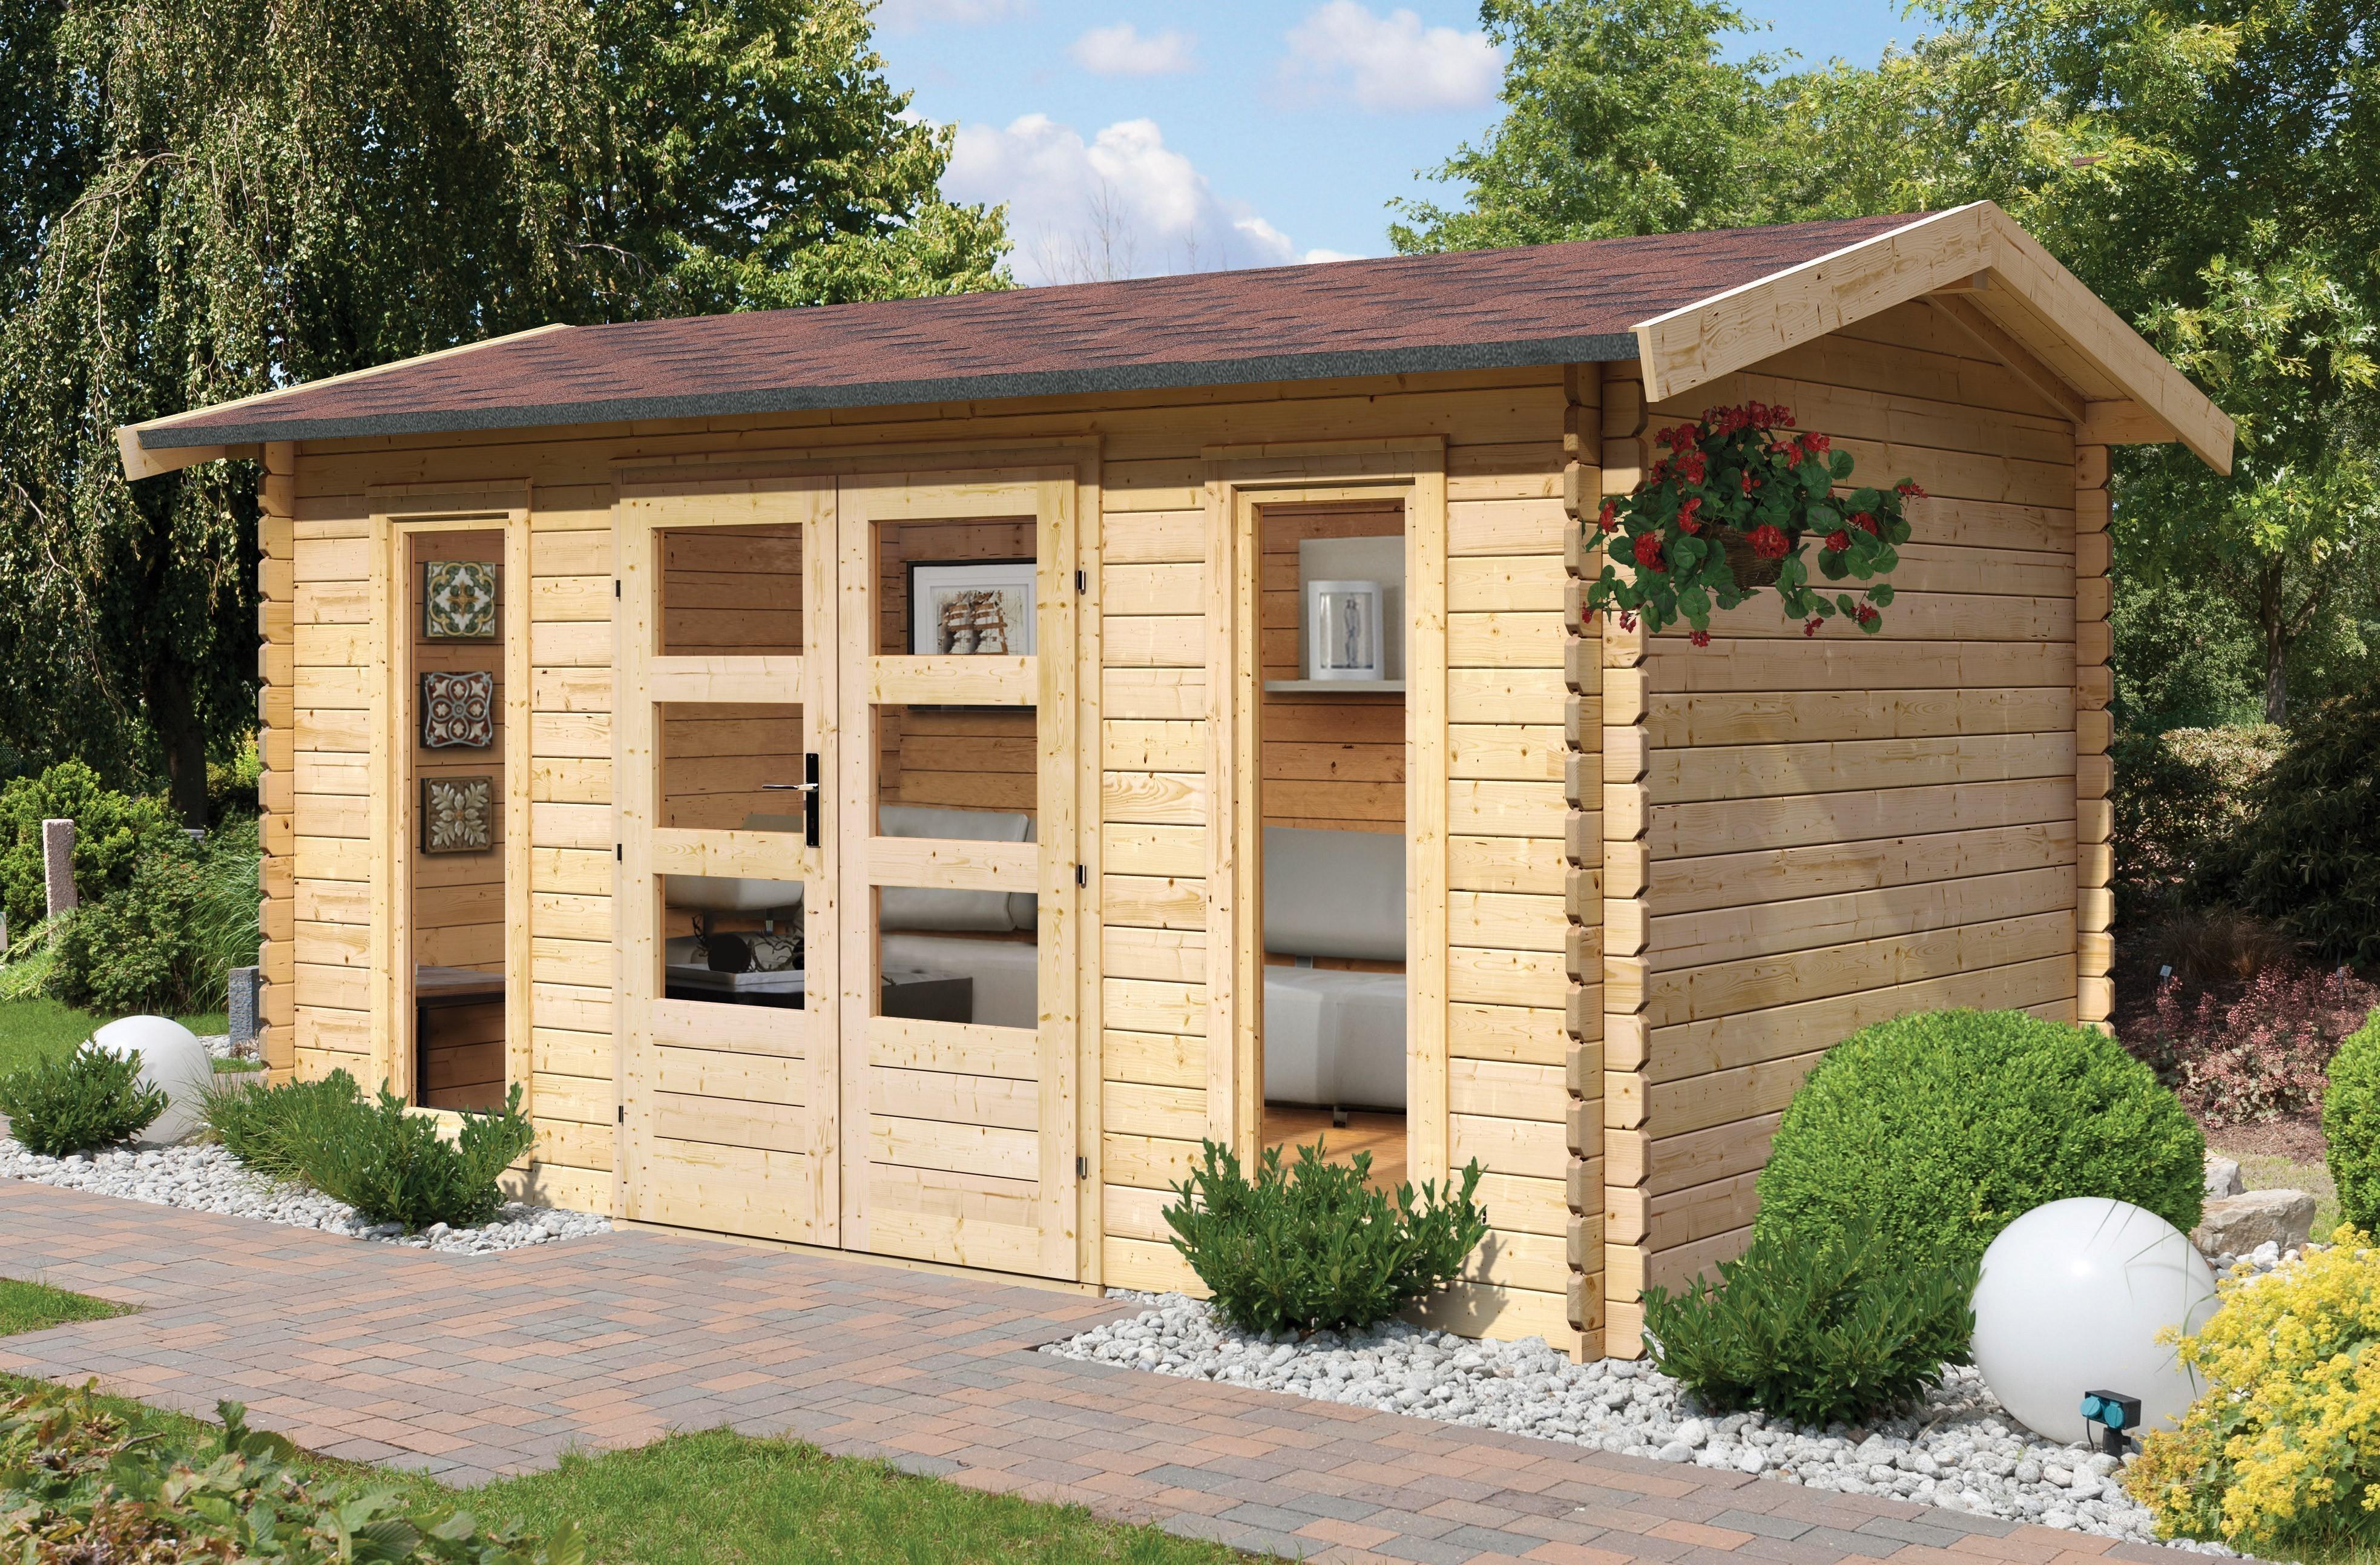 karibu gartenhaus 28 mm karibu hasselberg 457x260cm natur. Black Bedroom Furniture Sets. Home Design Ideas